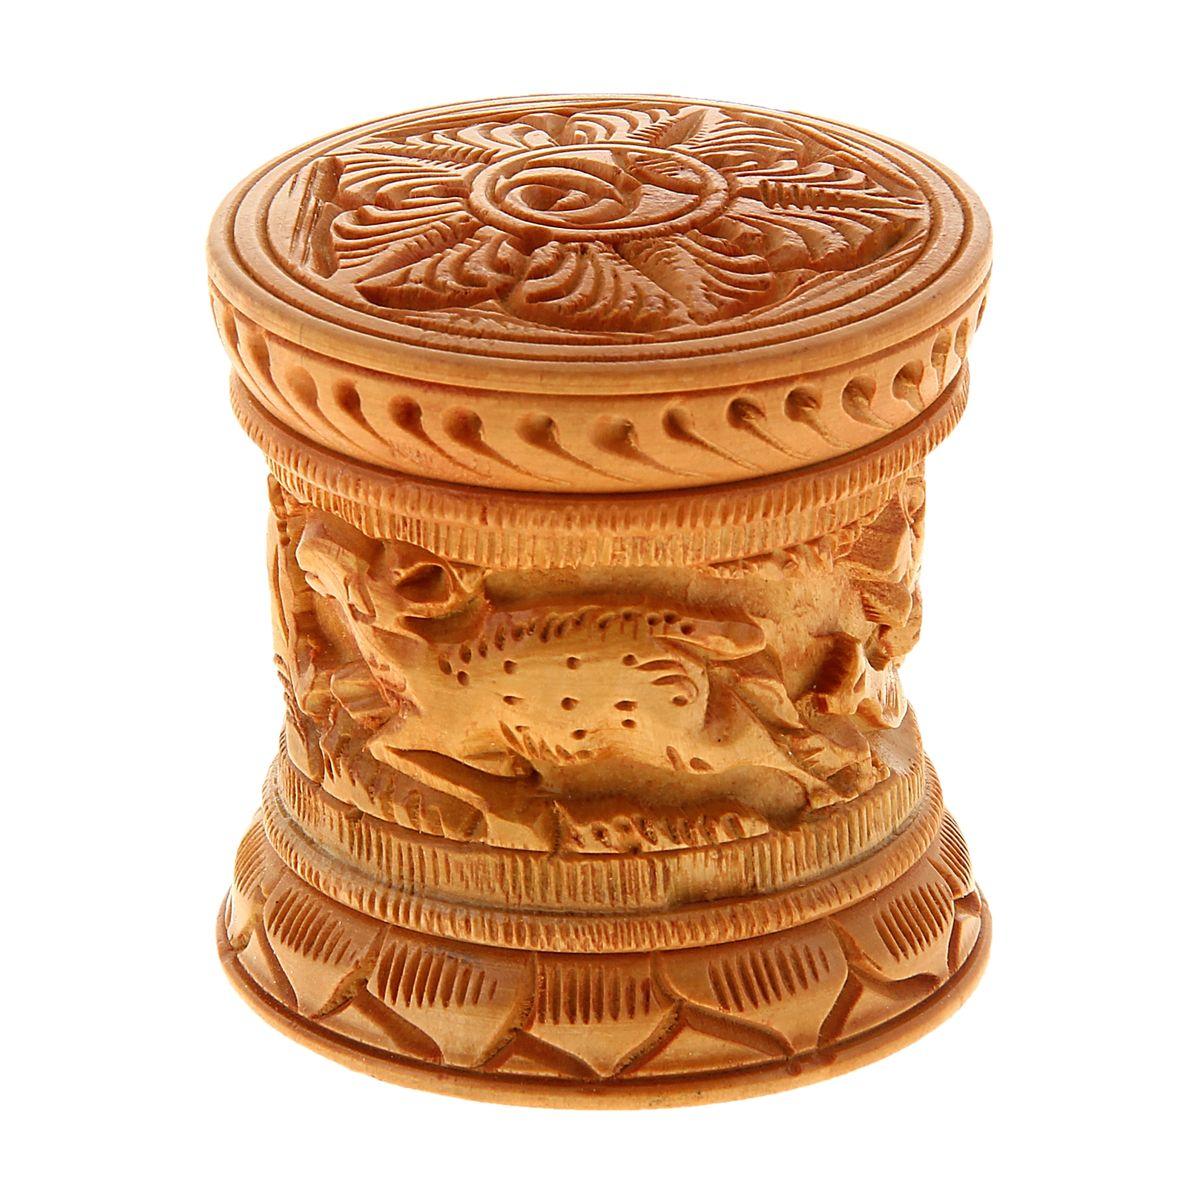 Шкатулка деревянная Резной узор, 6 см х 6 см х 6 см. 841018RG-D31SДерево